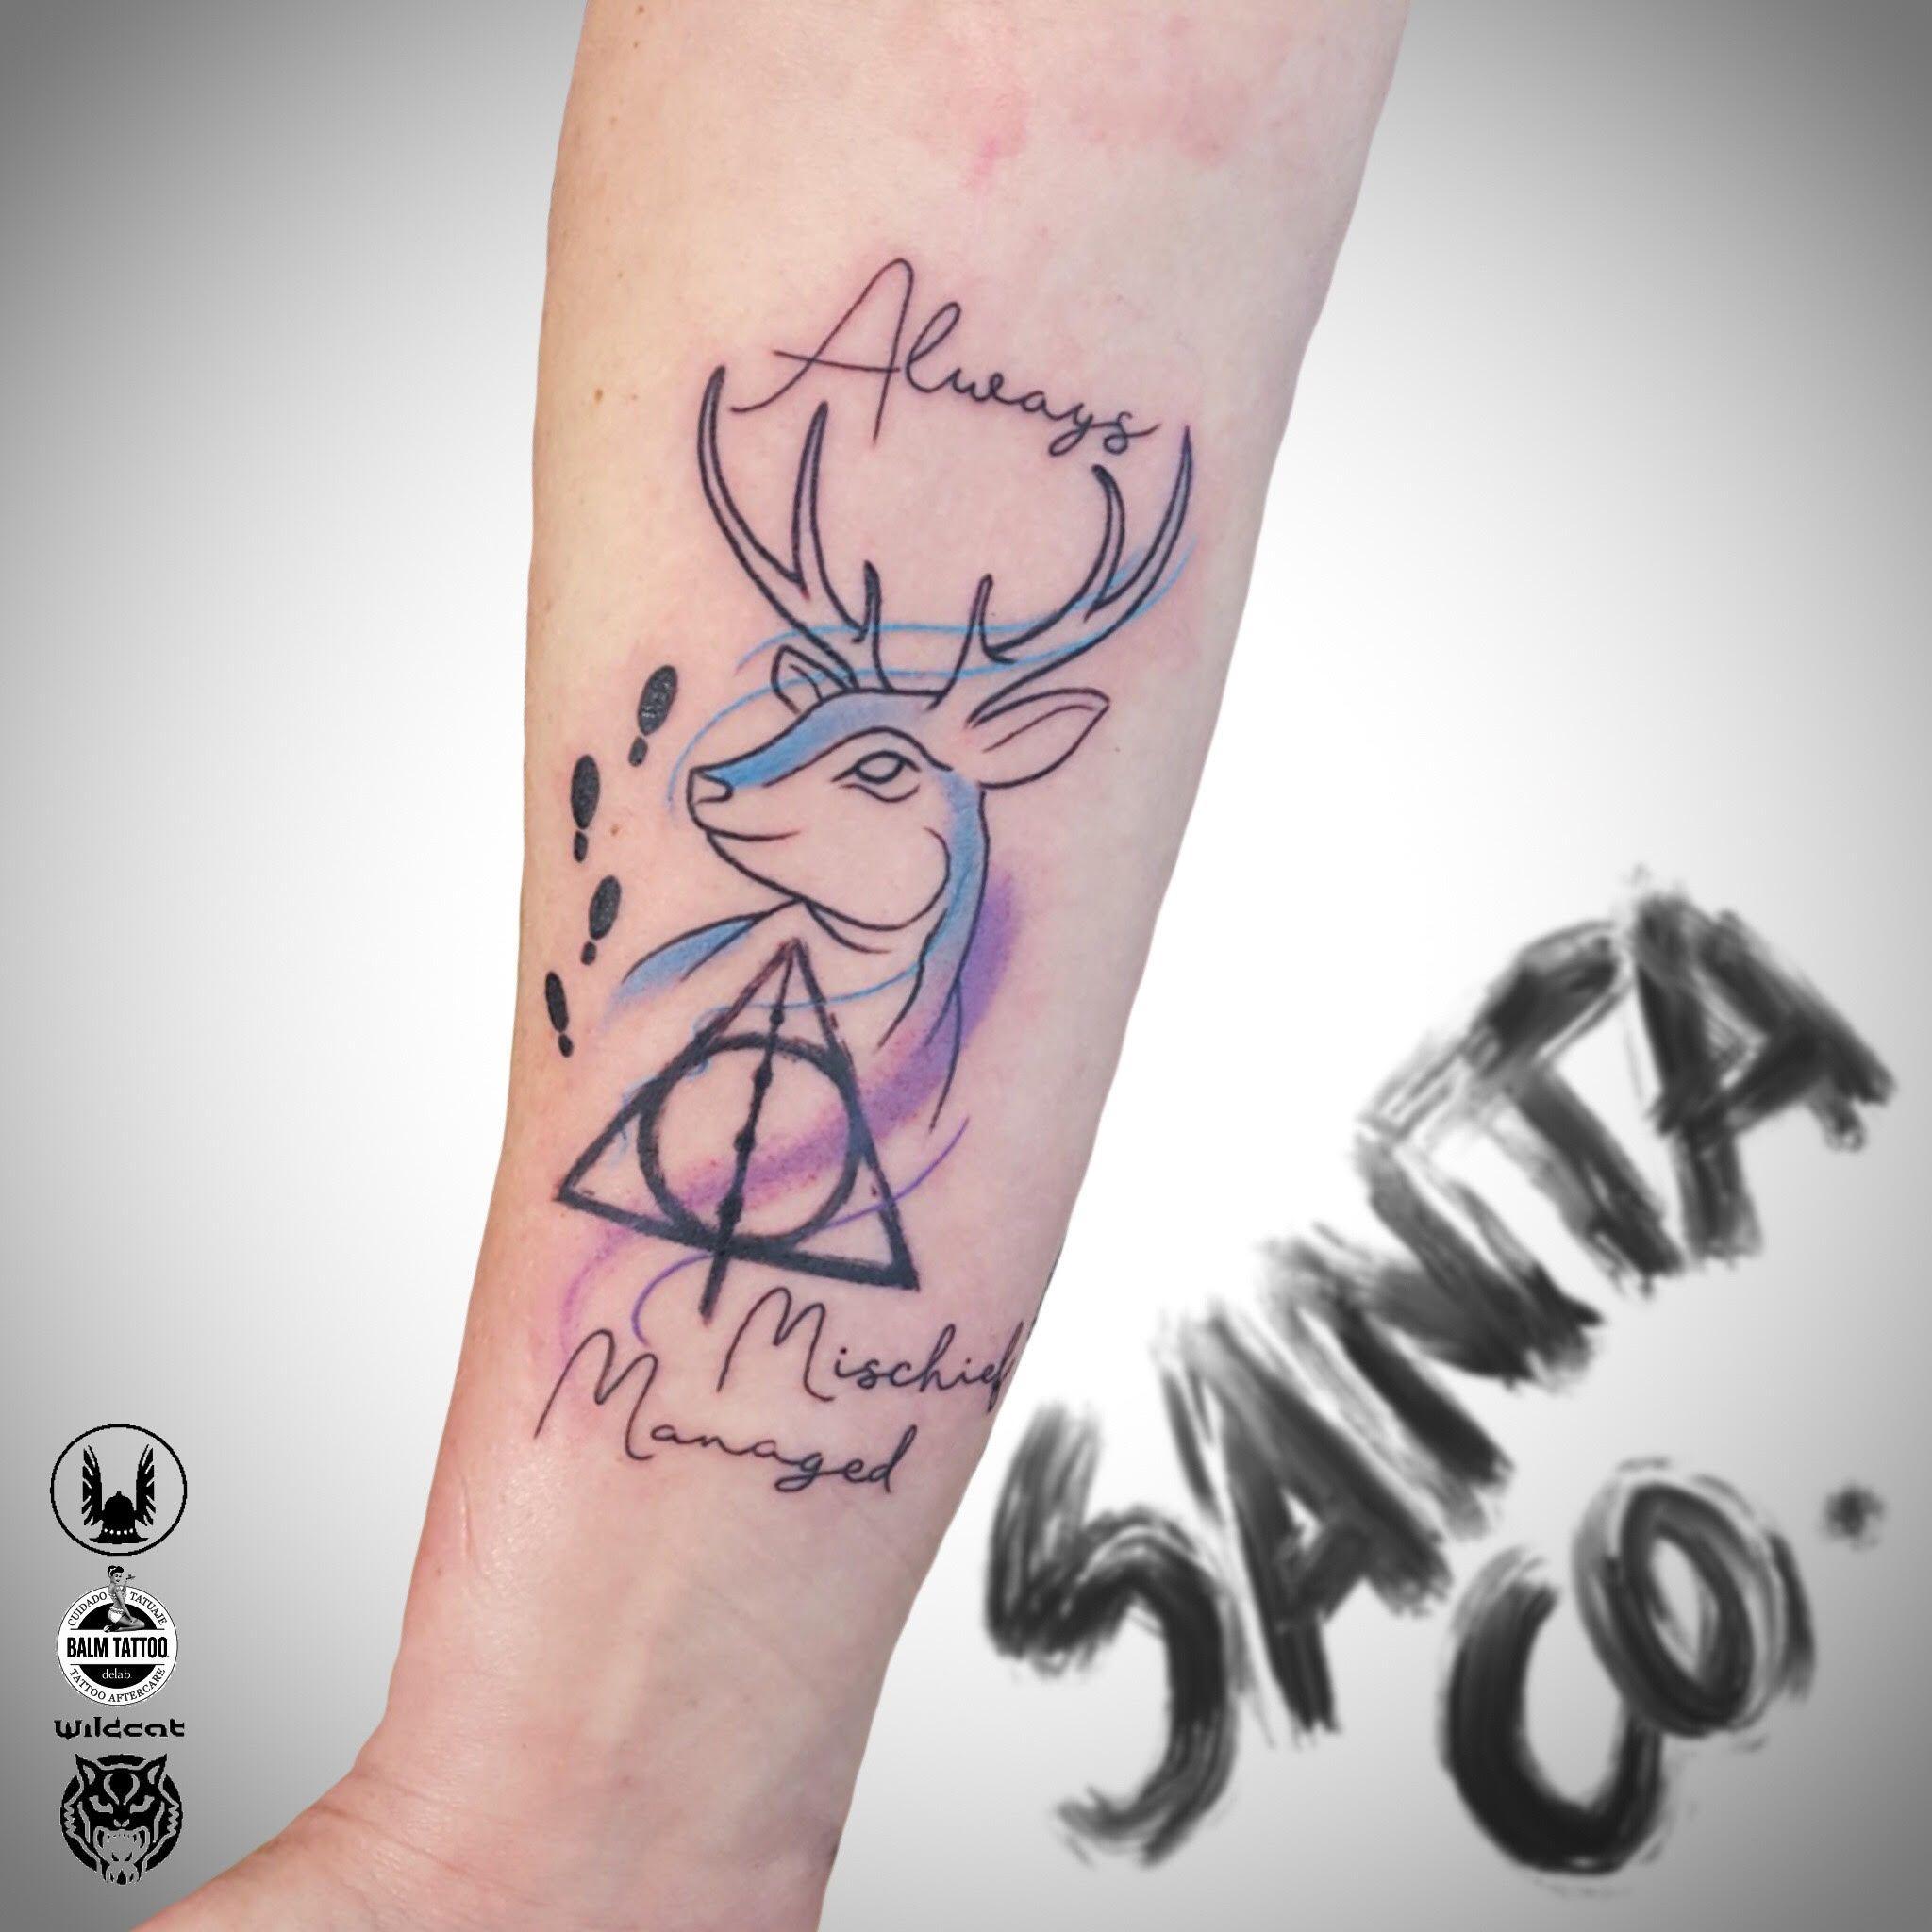 Centro de tatuajes Santa Coloma de Gramenet